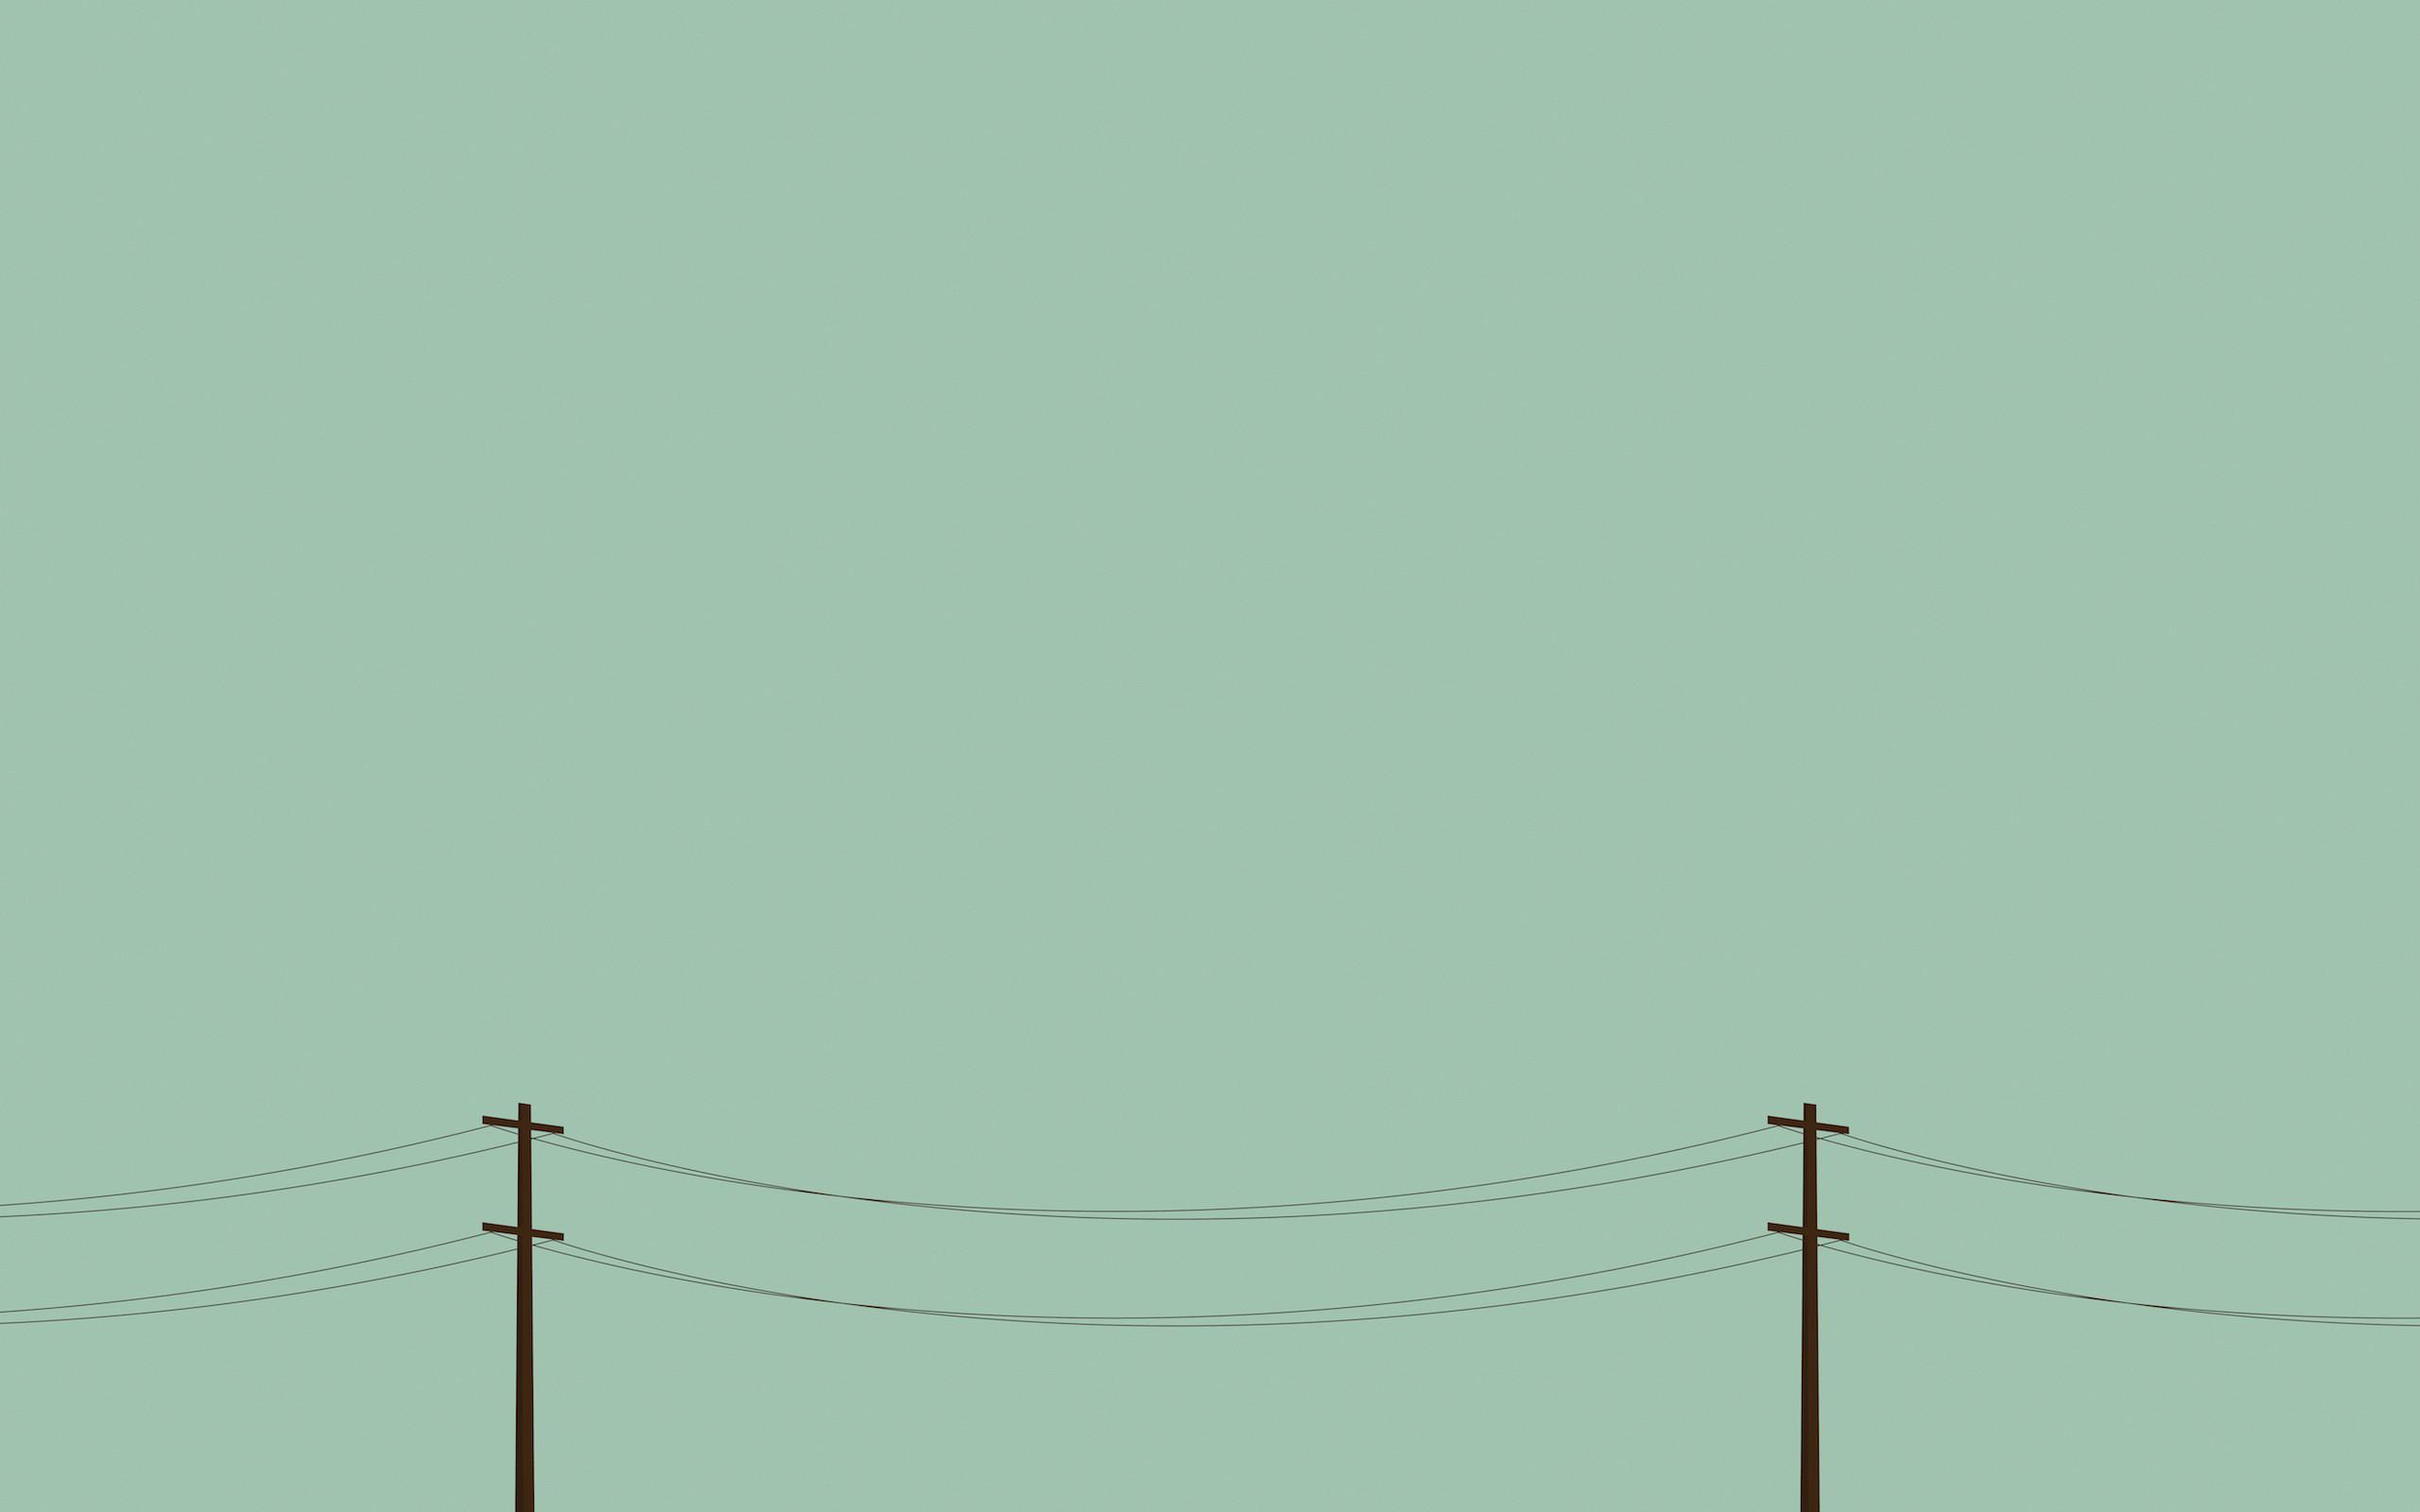 minimalistic desktop wallpapers